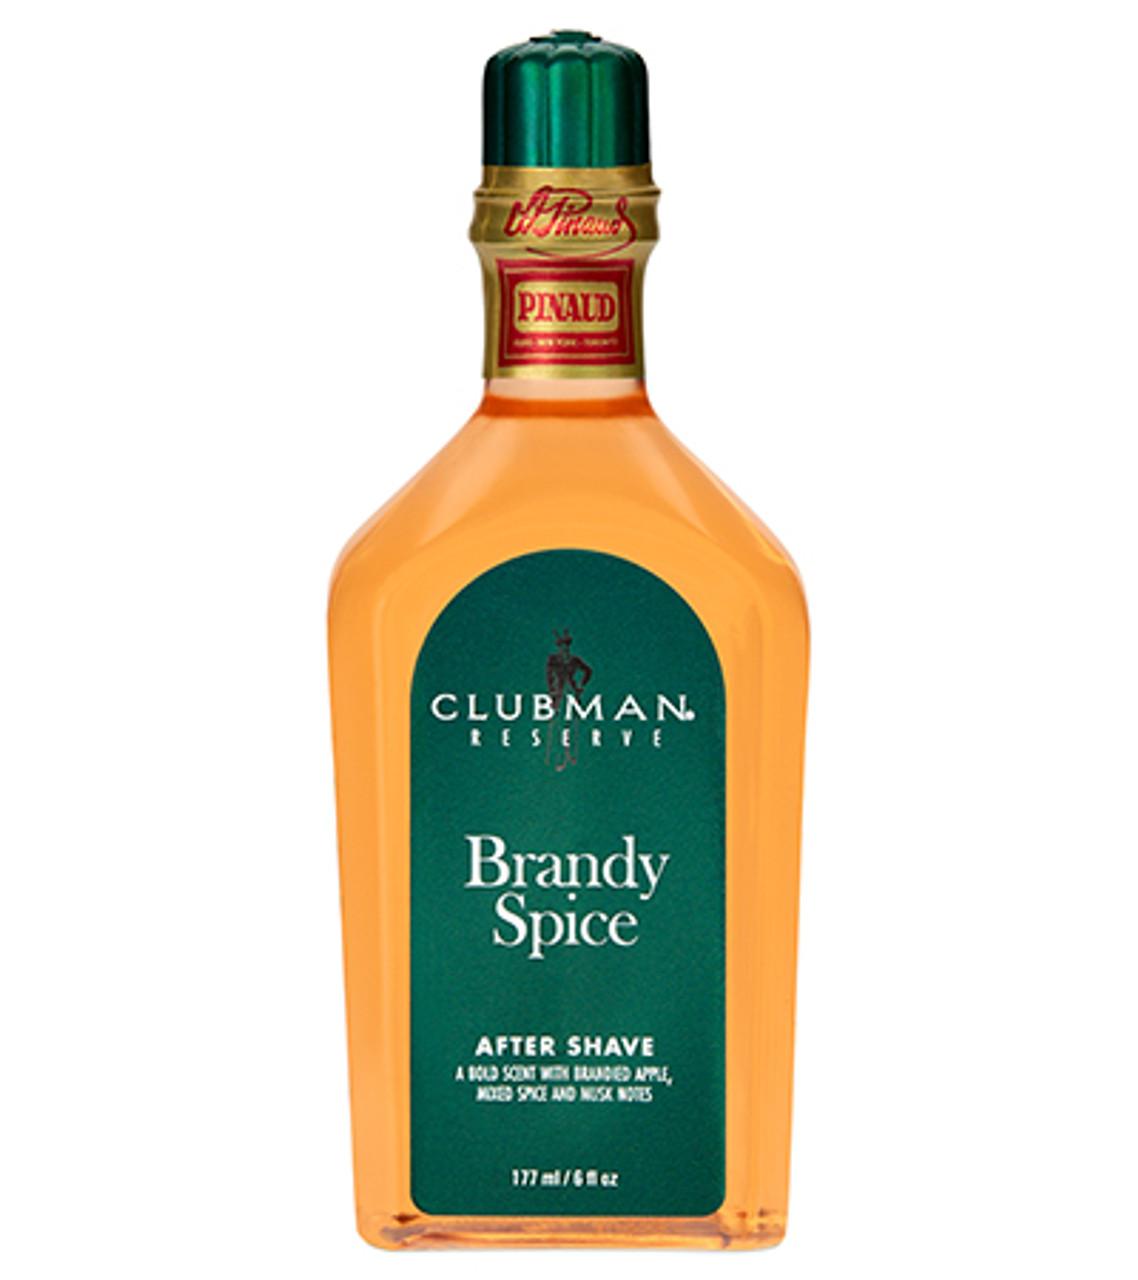 Clubman Brandy Spice Aftershave 6oz.